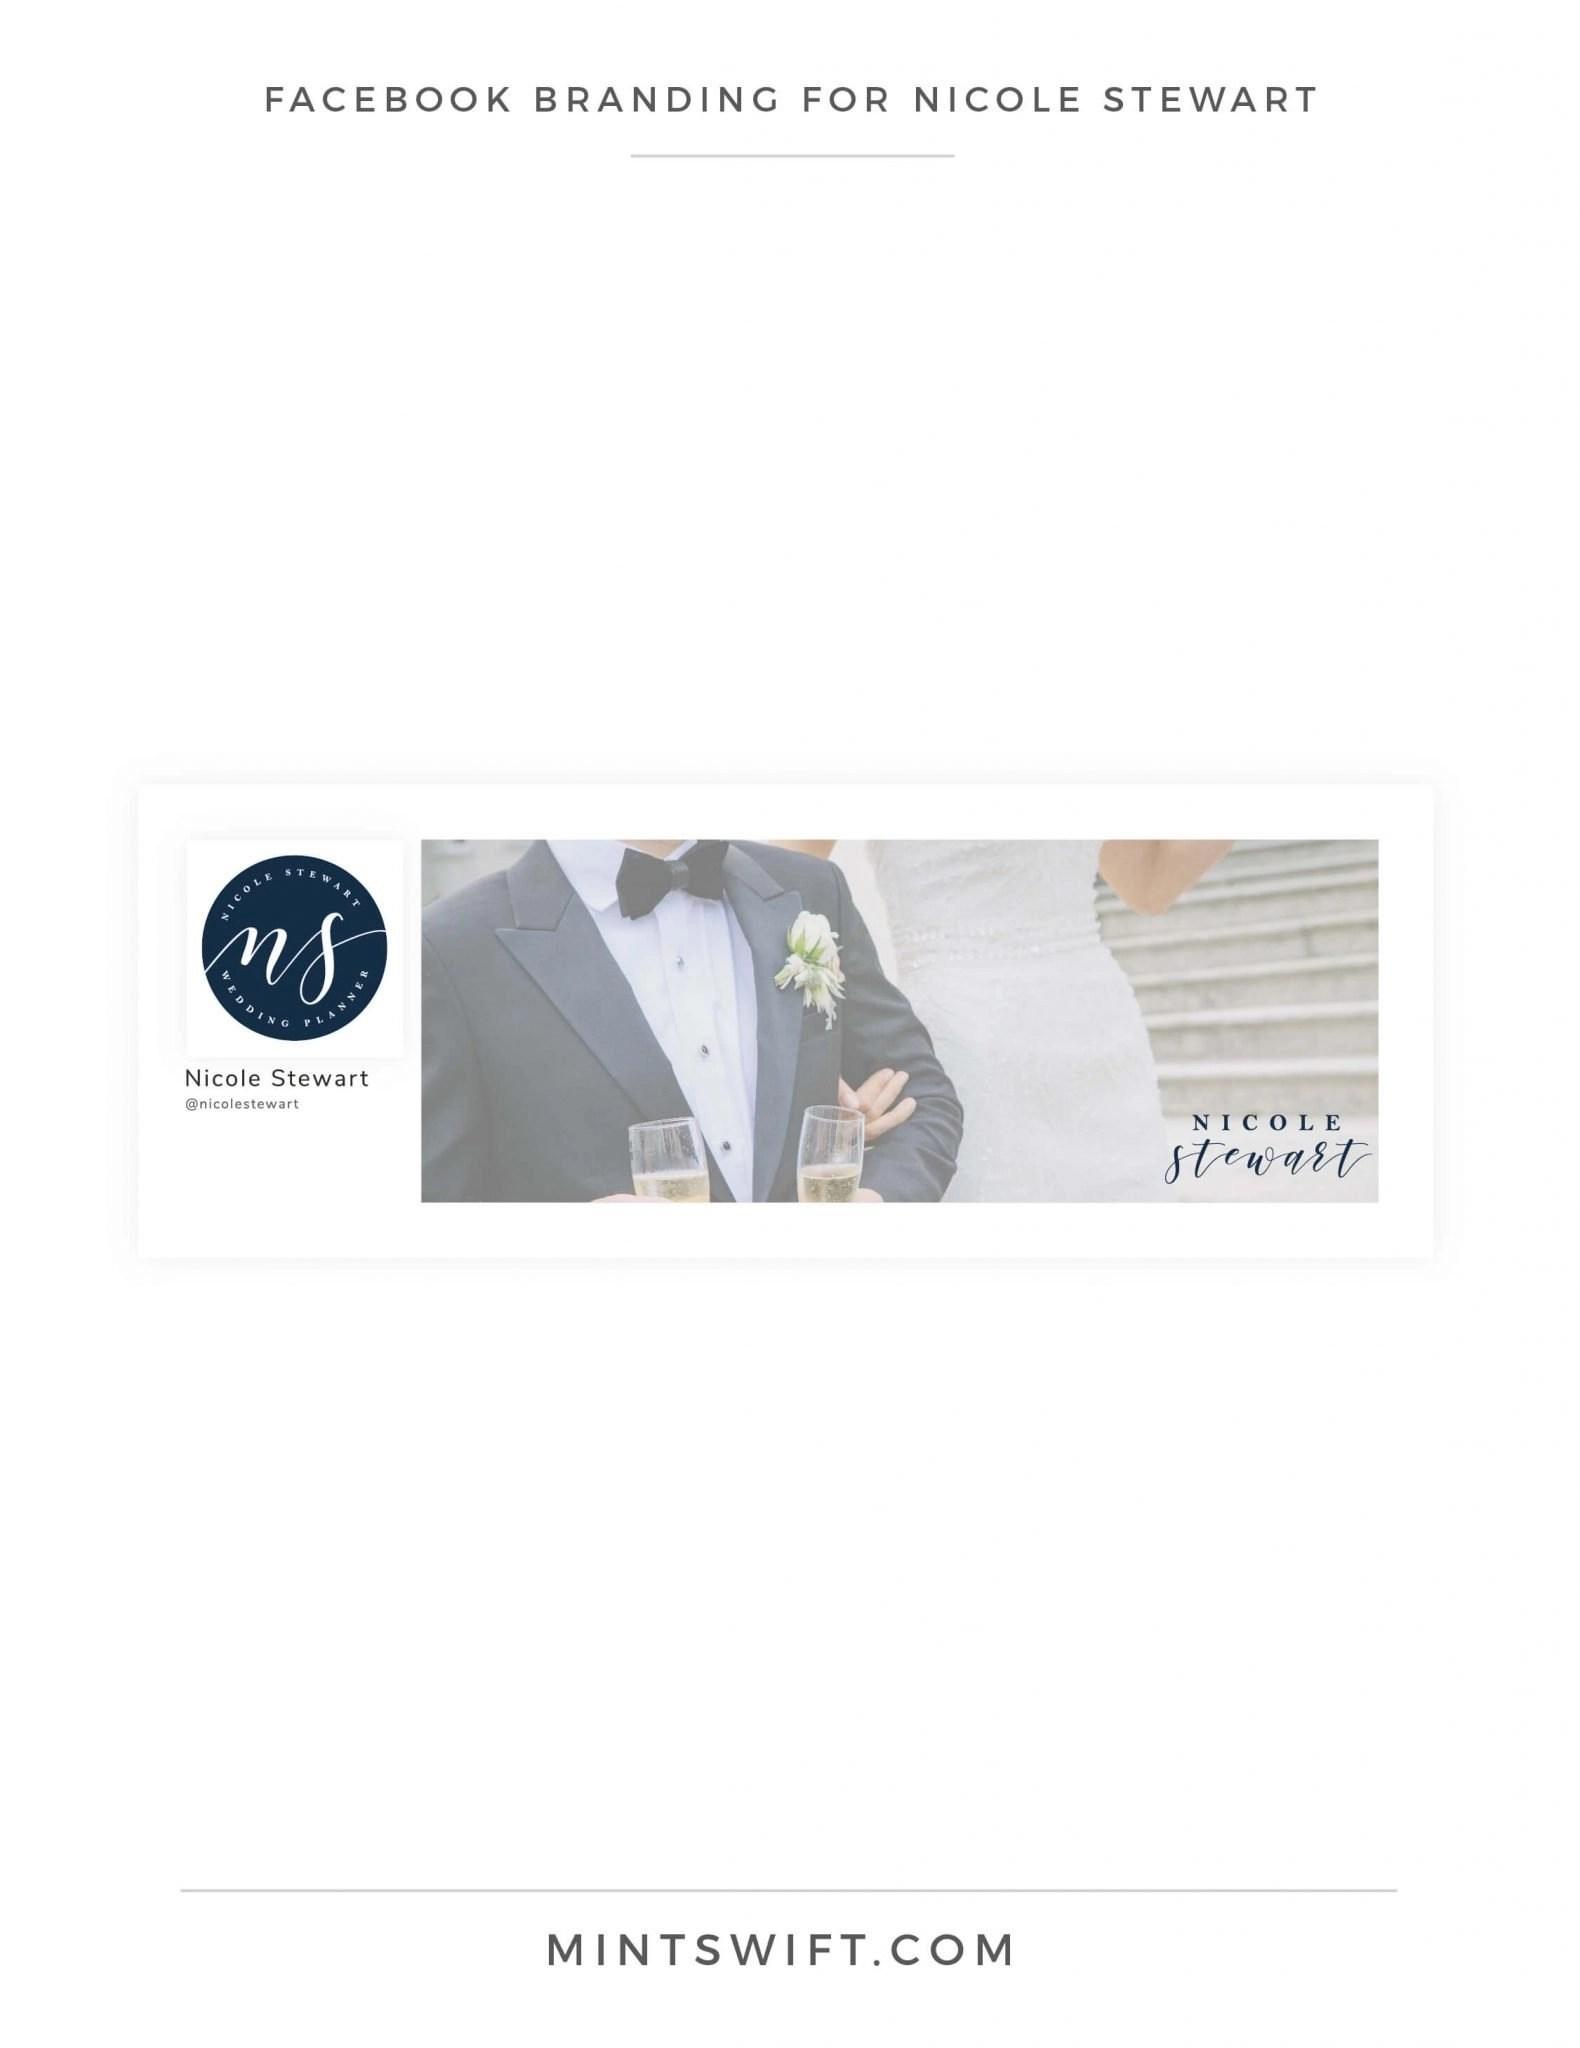 Nicole Stewart - Facebook Branding - Brand Design Package - MintSwift